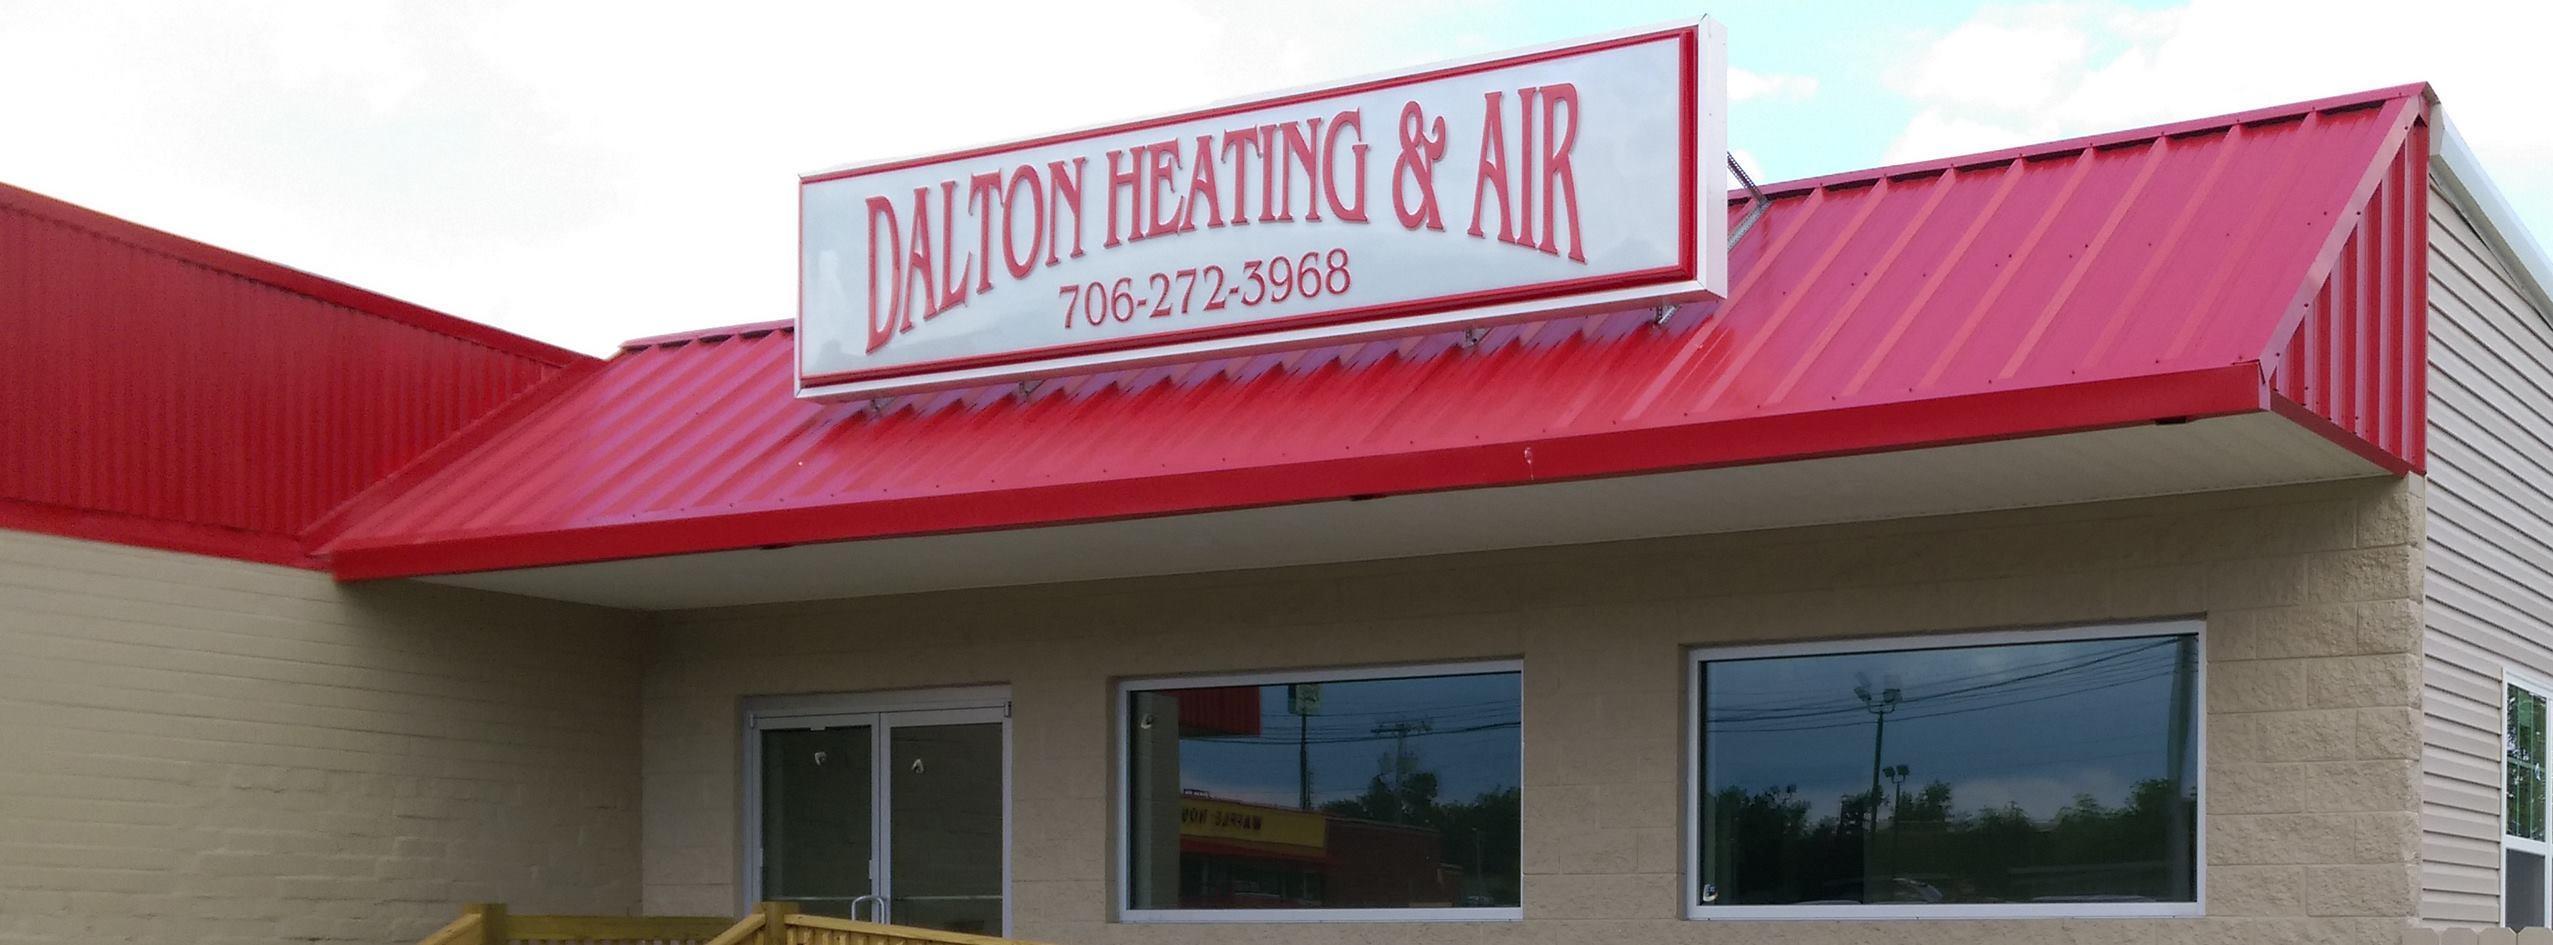 Dalton Heating & Air image 0